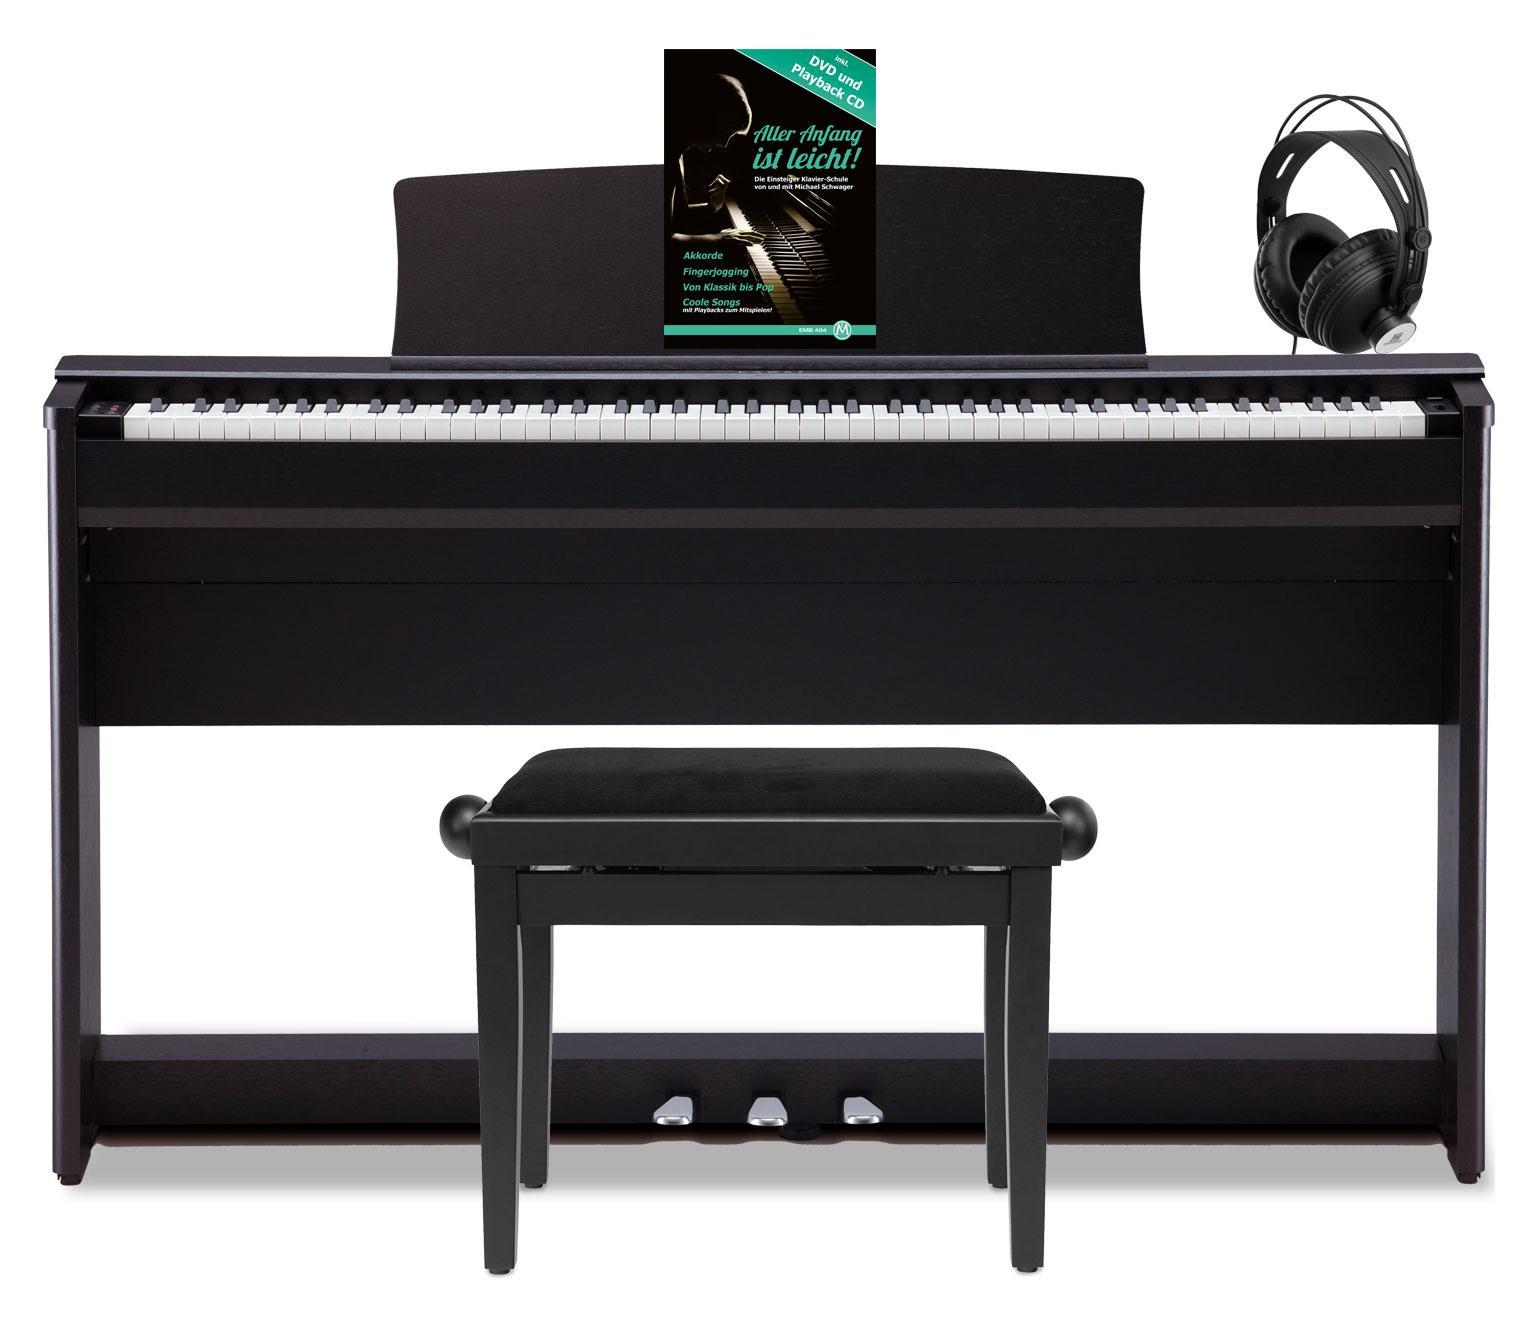 Kawai CL 36 SB Digitalpiano Schwarz Satiniert Set inkl. Bank, Kopfhörer Klavierschule